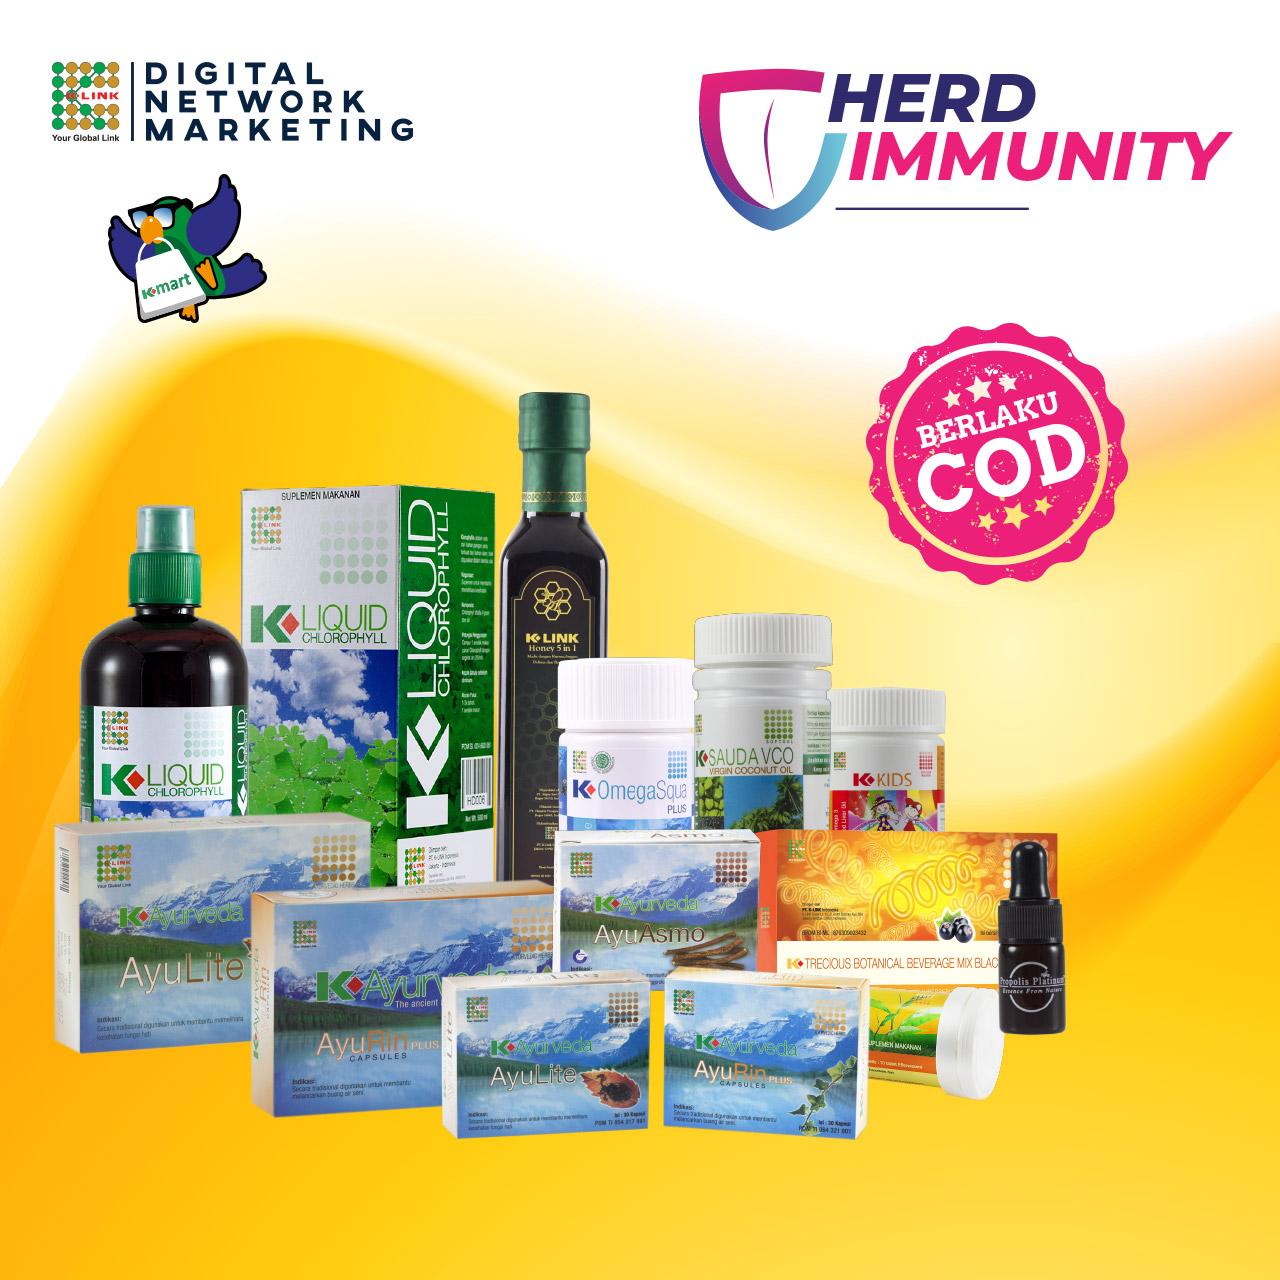 Promo Herd Immunity